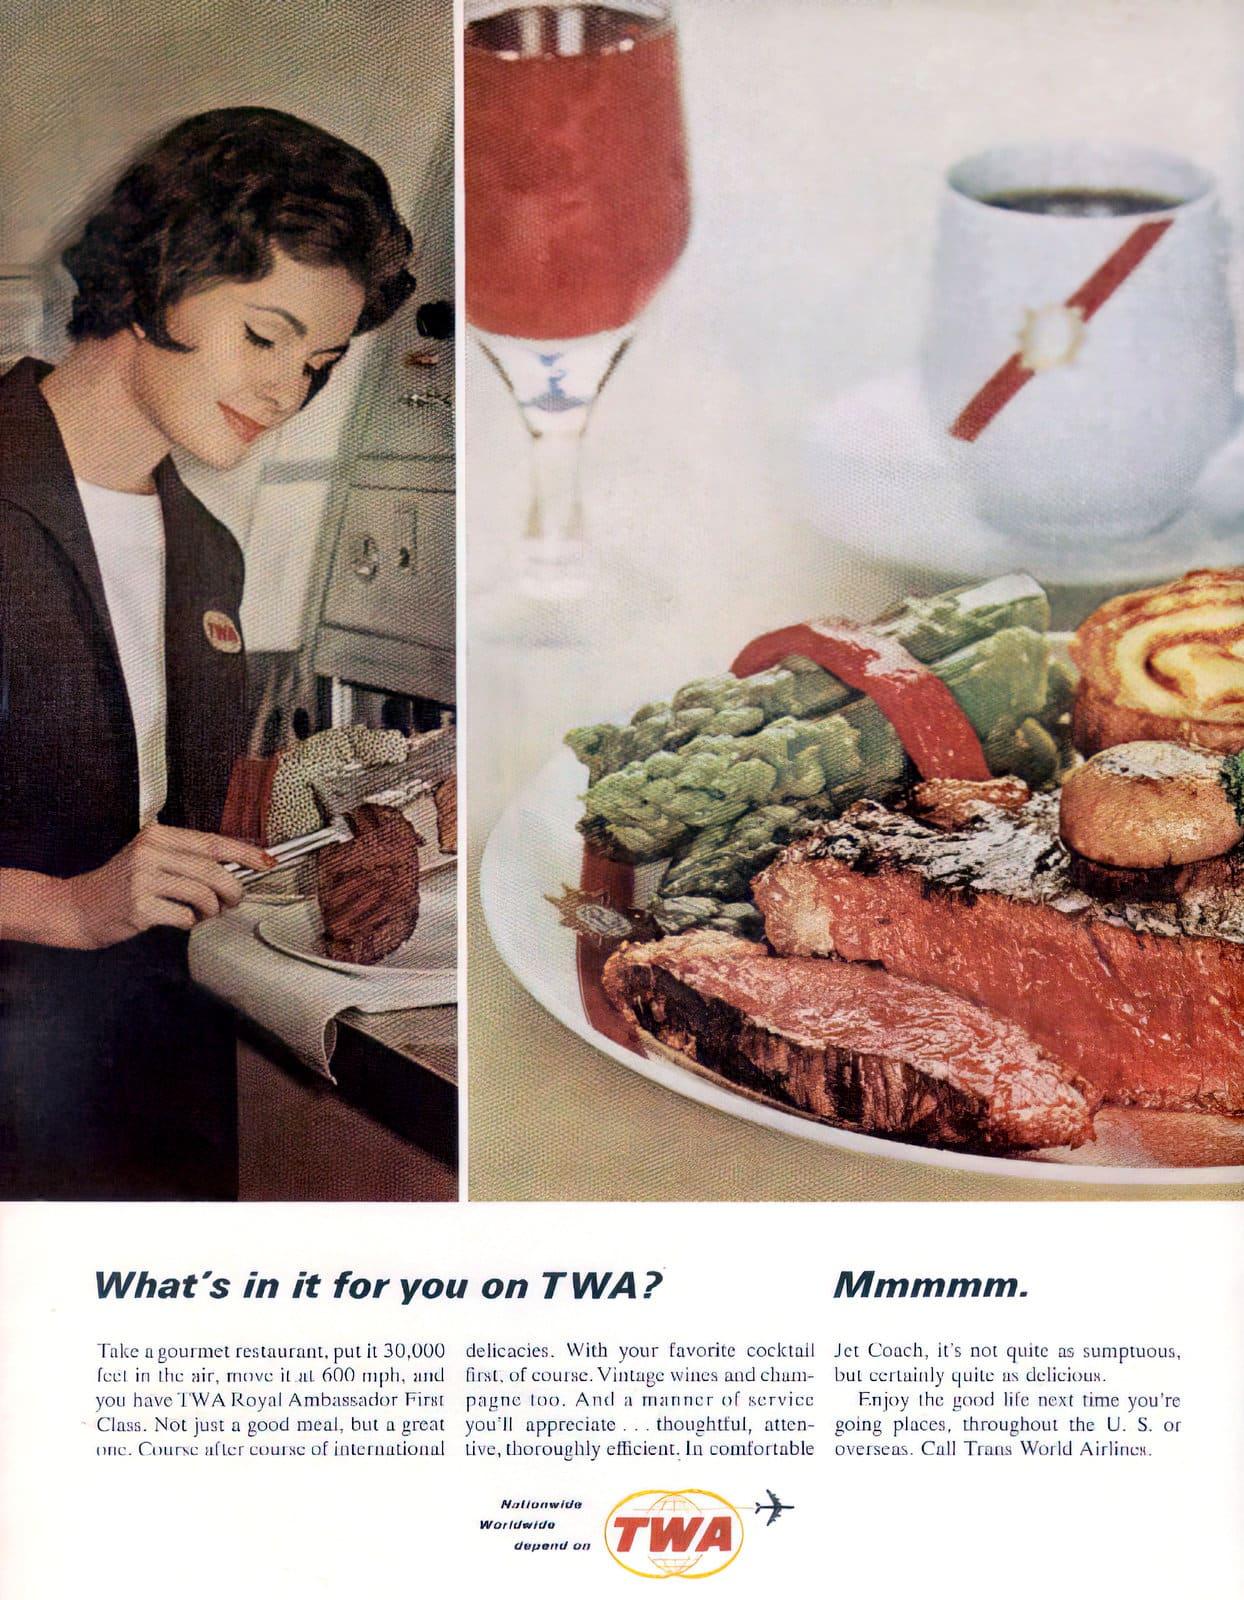 Vintage 60s TWA airlines stewardess with a steak dinner (1964)